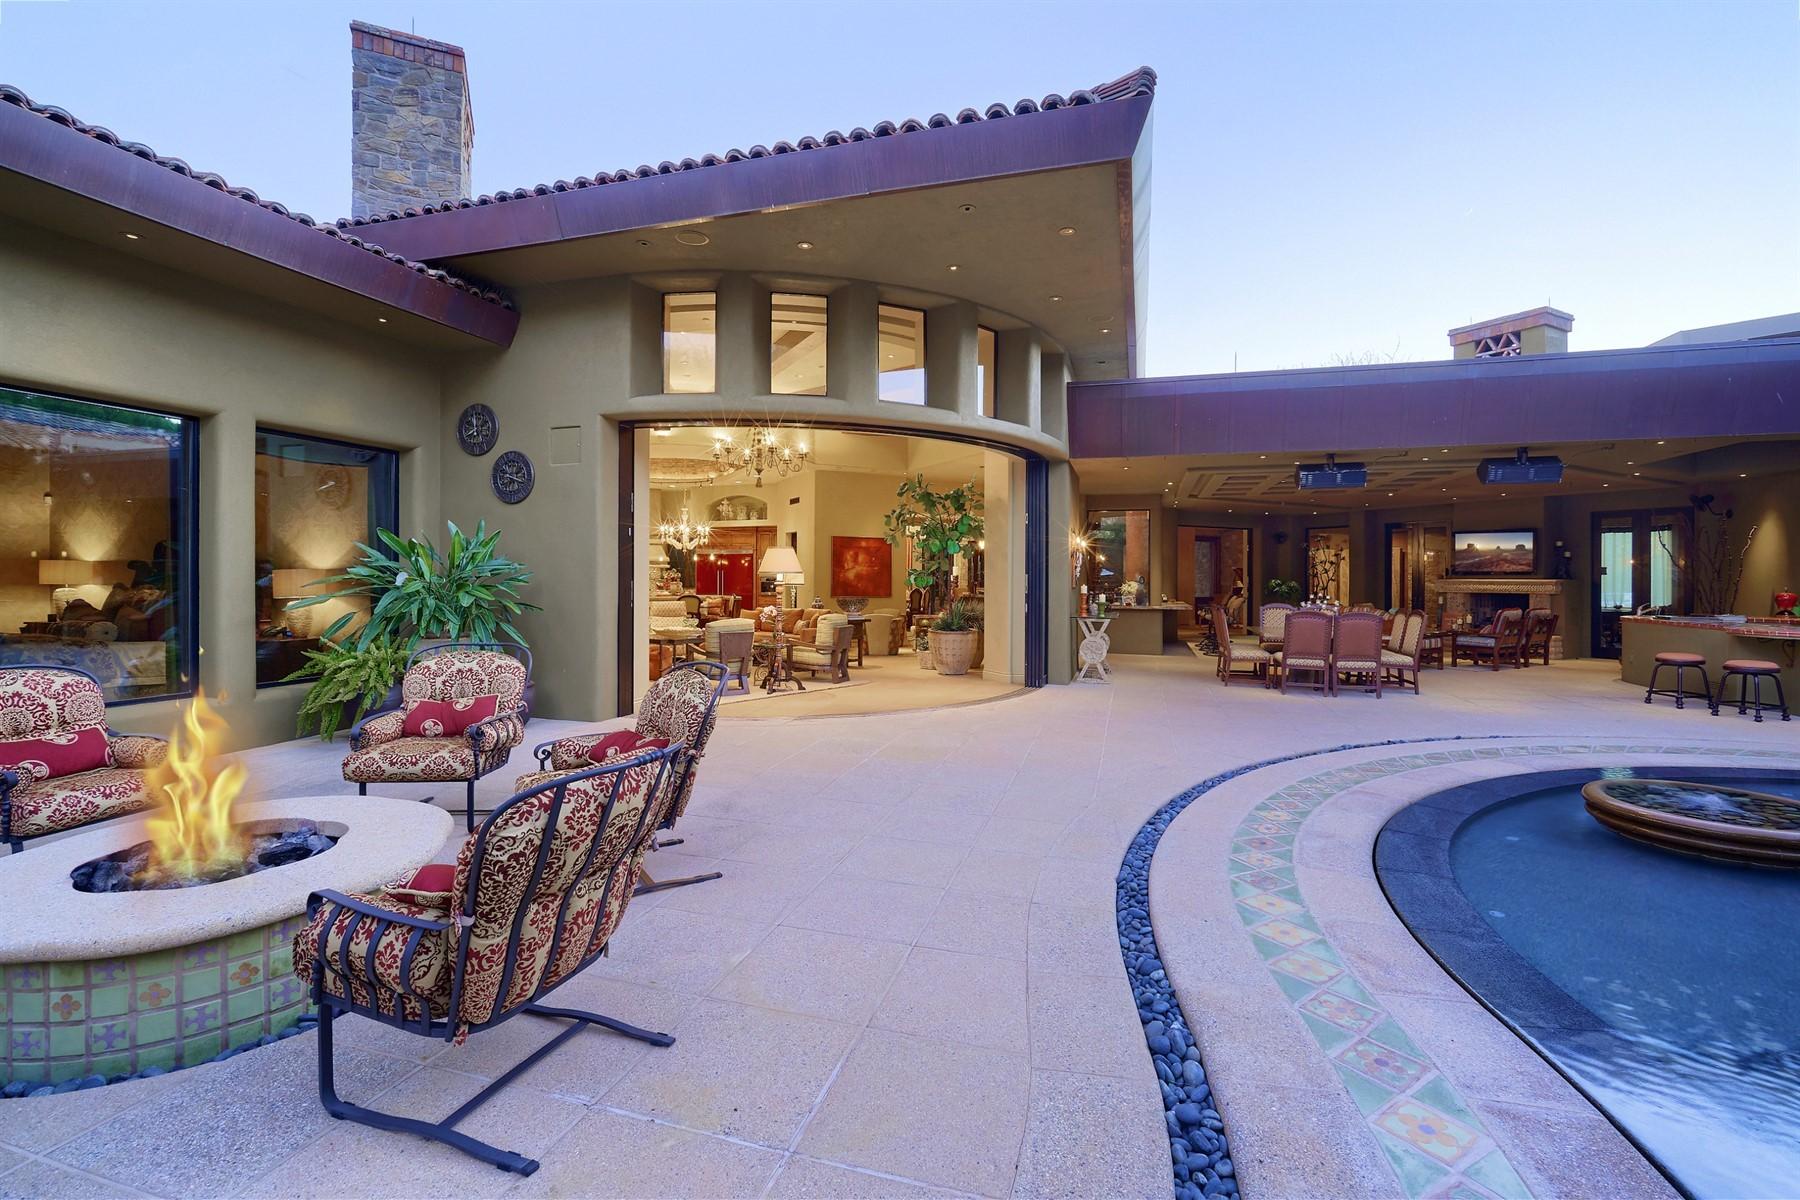 Single Family Homes for Active at Modern Hacienda with Camelback Mountain Views 5144 E Palomino Road Phoenix, Arizona 85018 United States